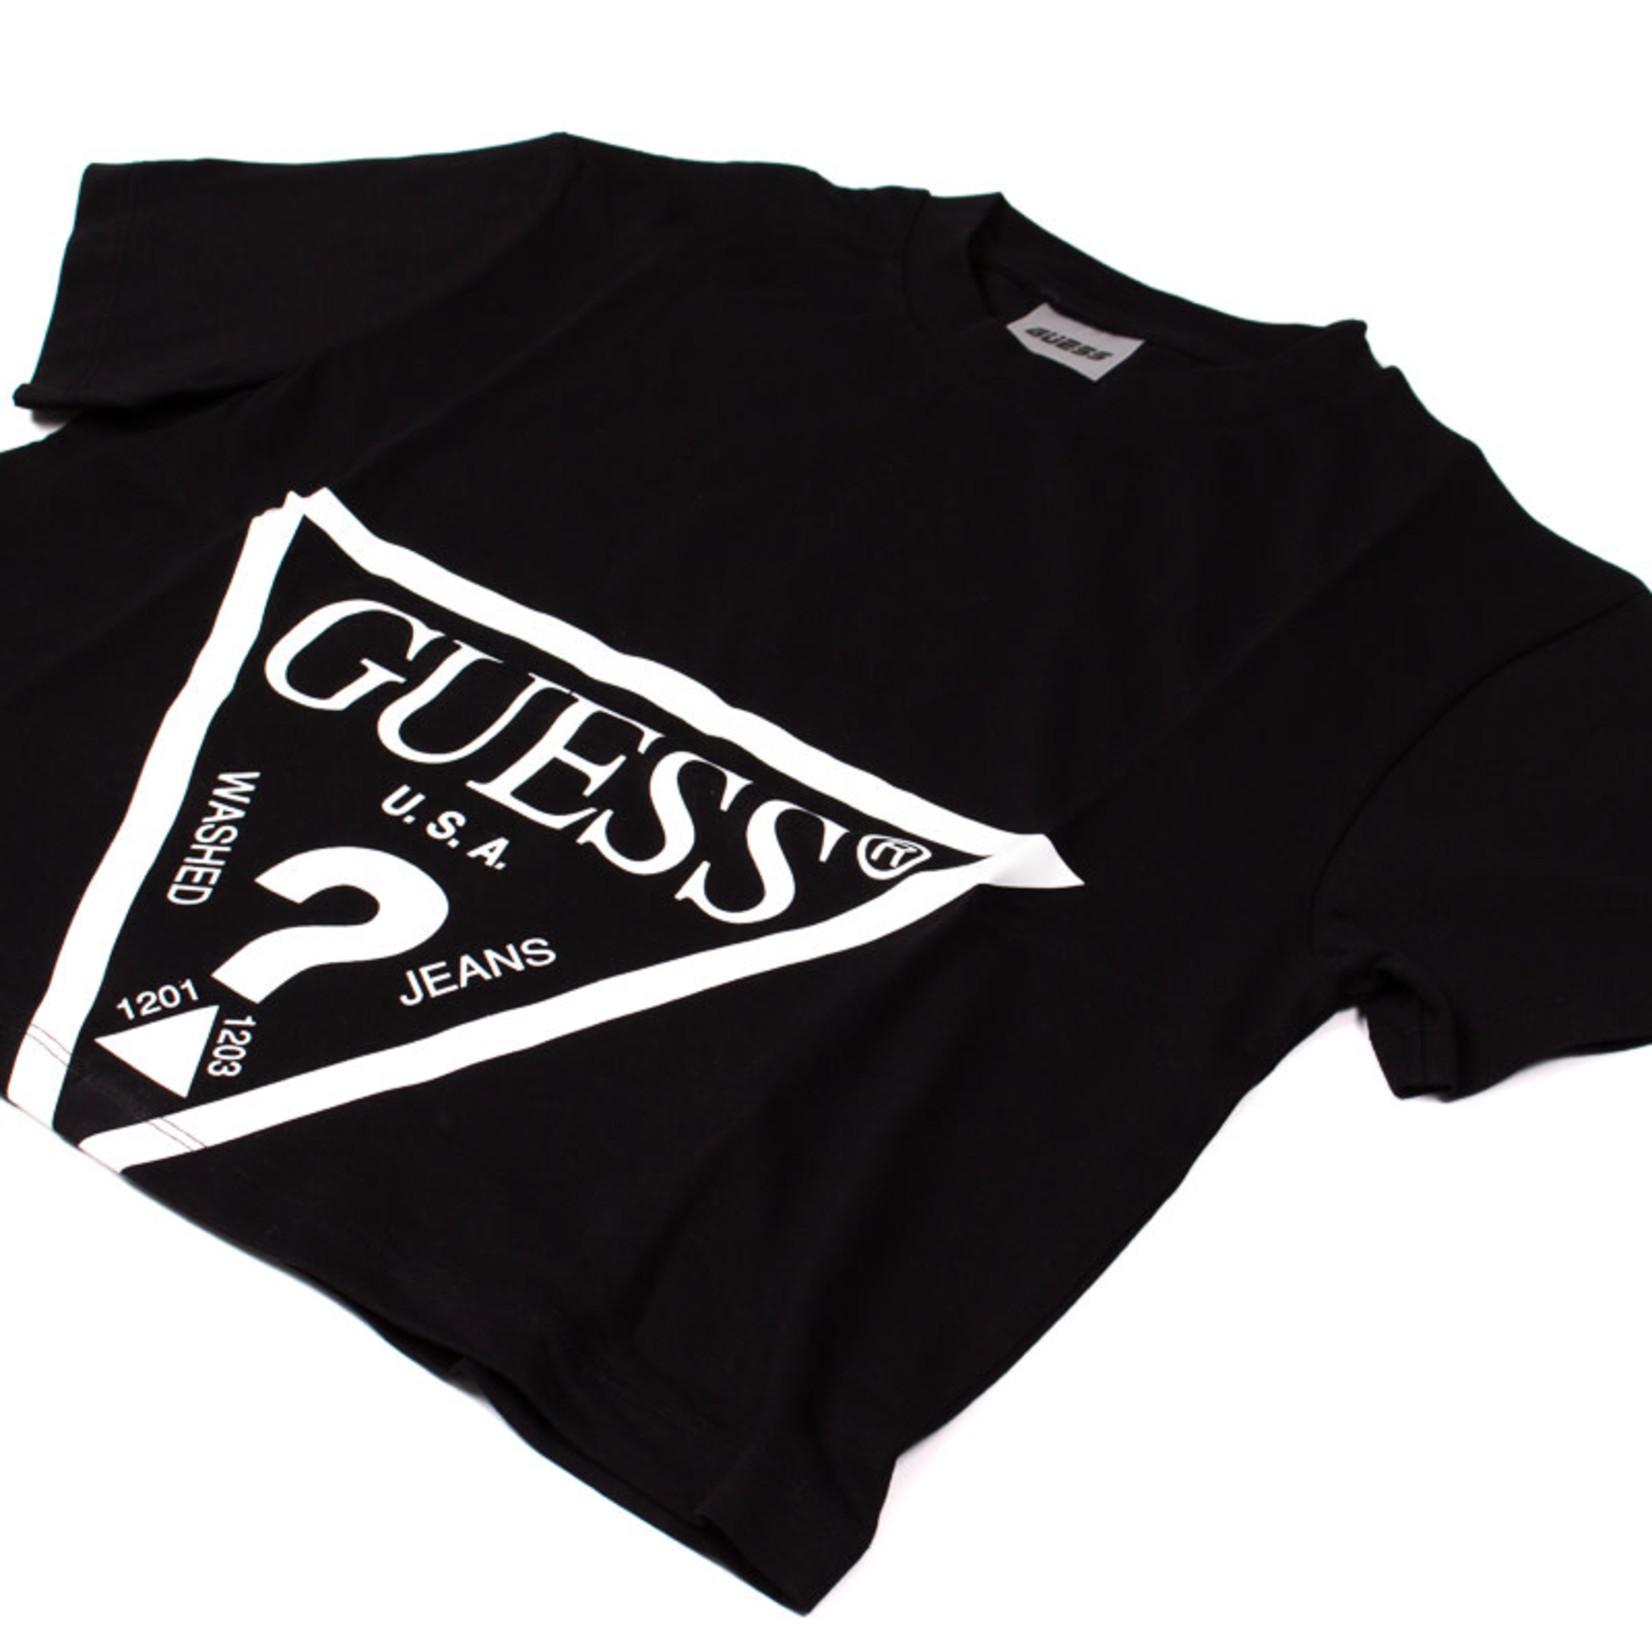 Guess Guess : Adele Crop T-Shirt